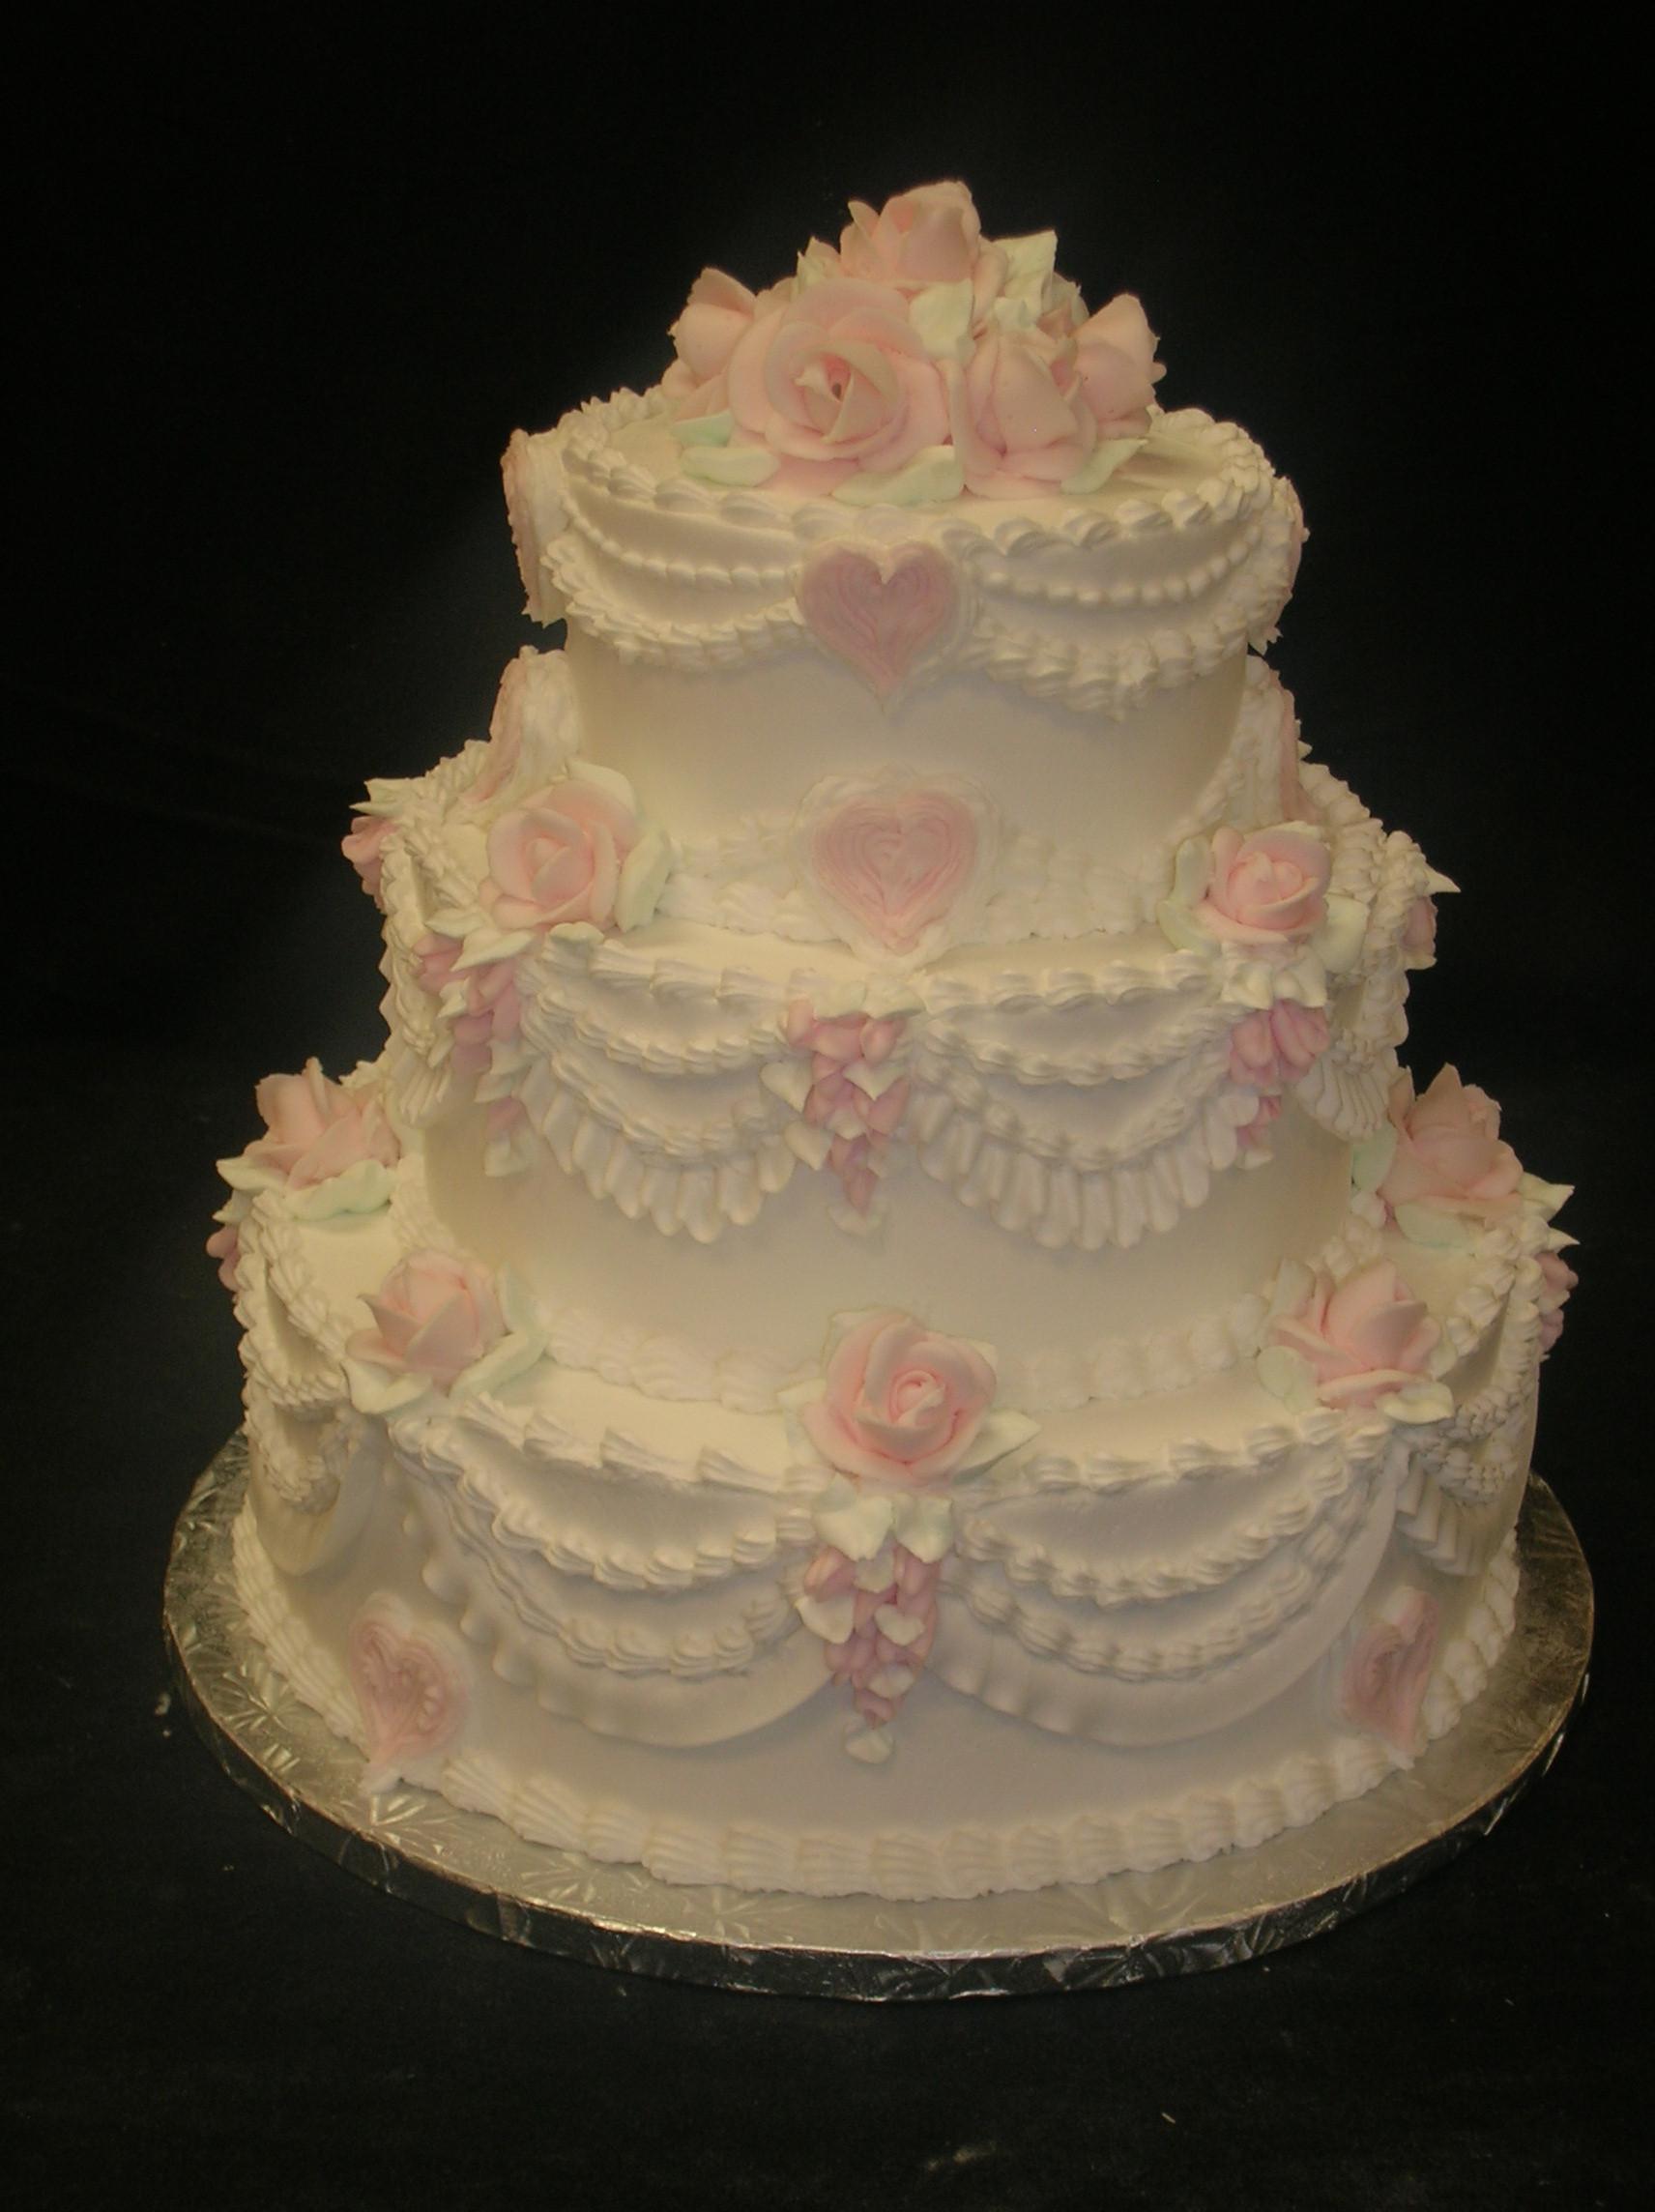 Wedding Cakes With Buttercream Icing  Buttercream wedding cake ideas idea in 2017